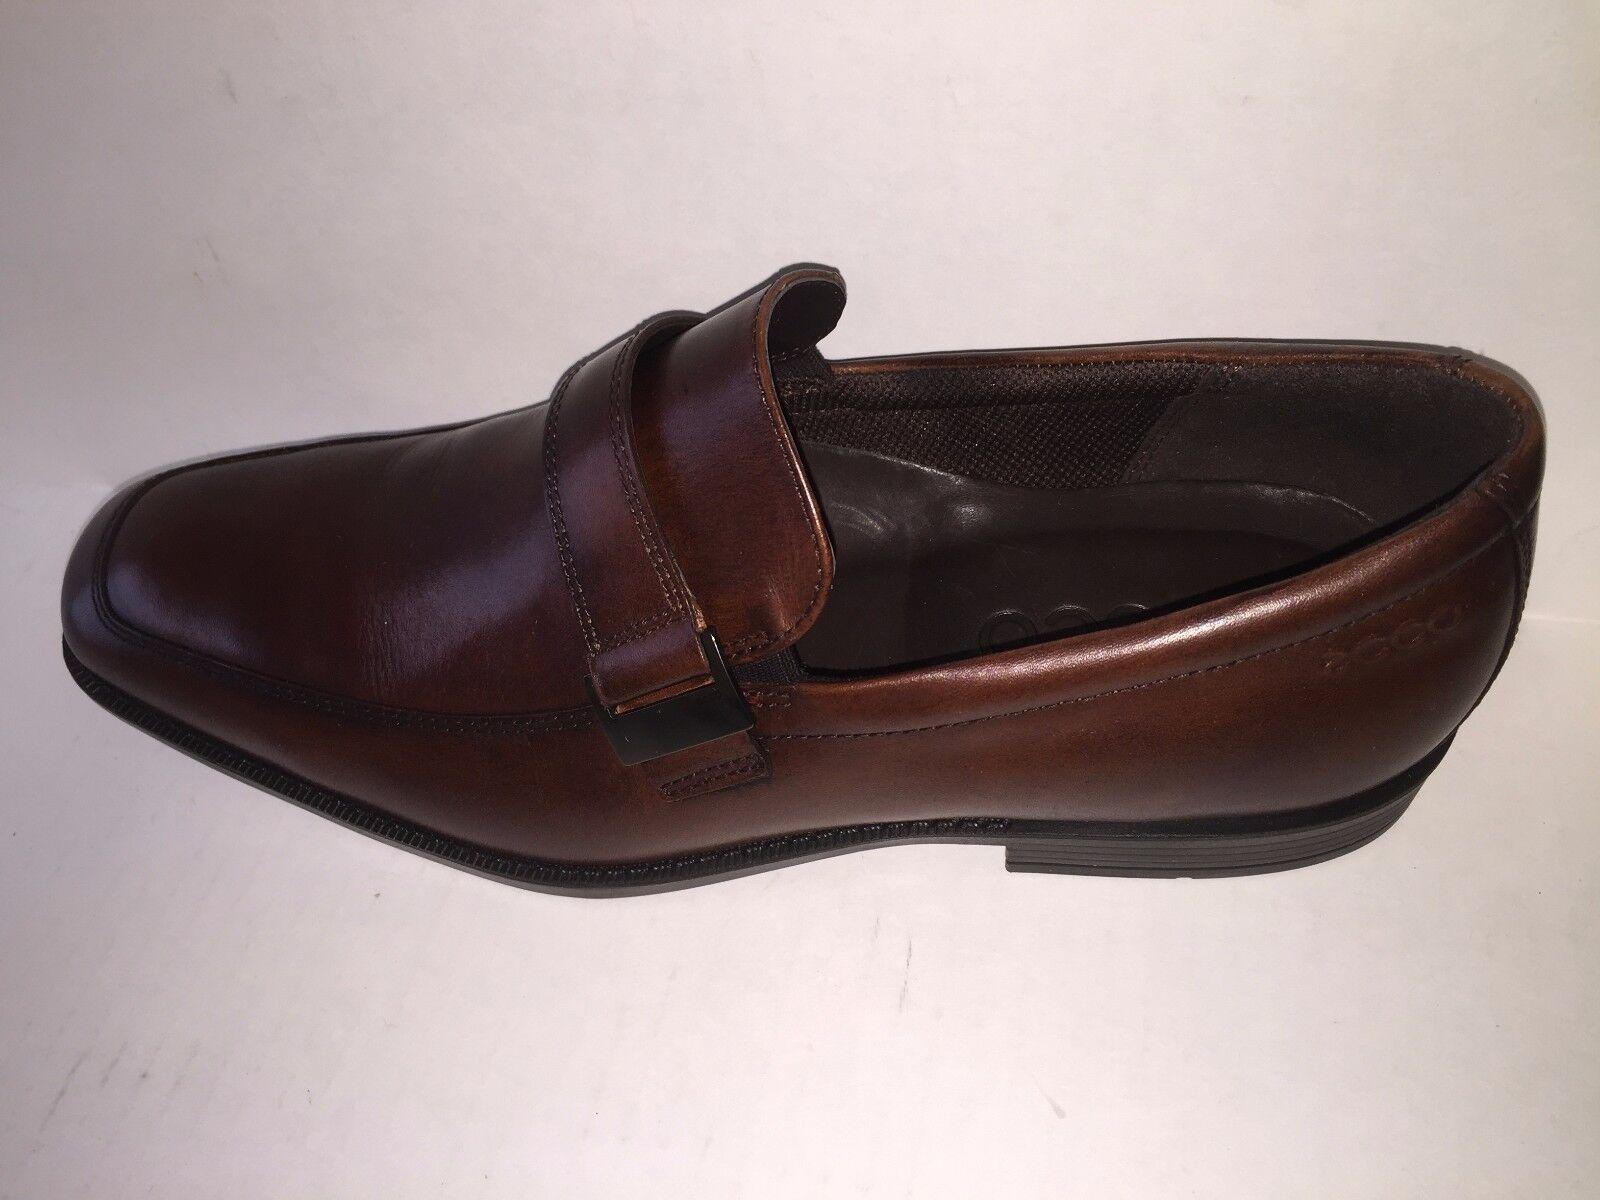 nessun minimo ECCO Uomo Edinburgh Buckle Slip On Loafers scarpe (Mink (Mink (Mink Marrone) 63255401014  NEW  ordinare on-line